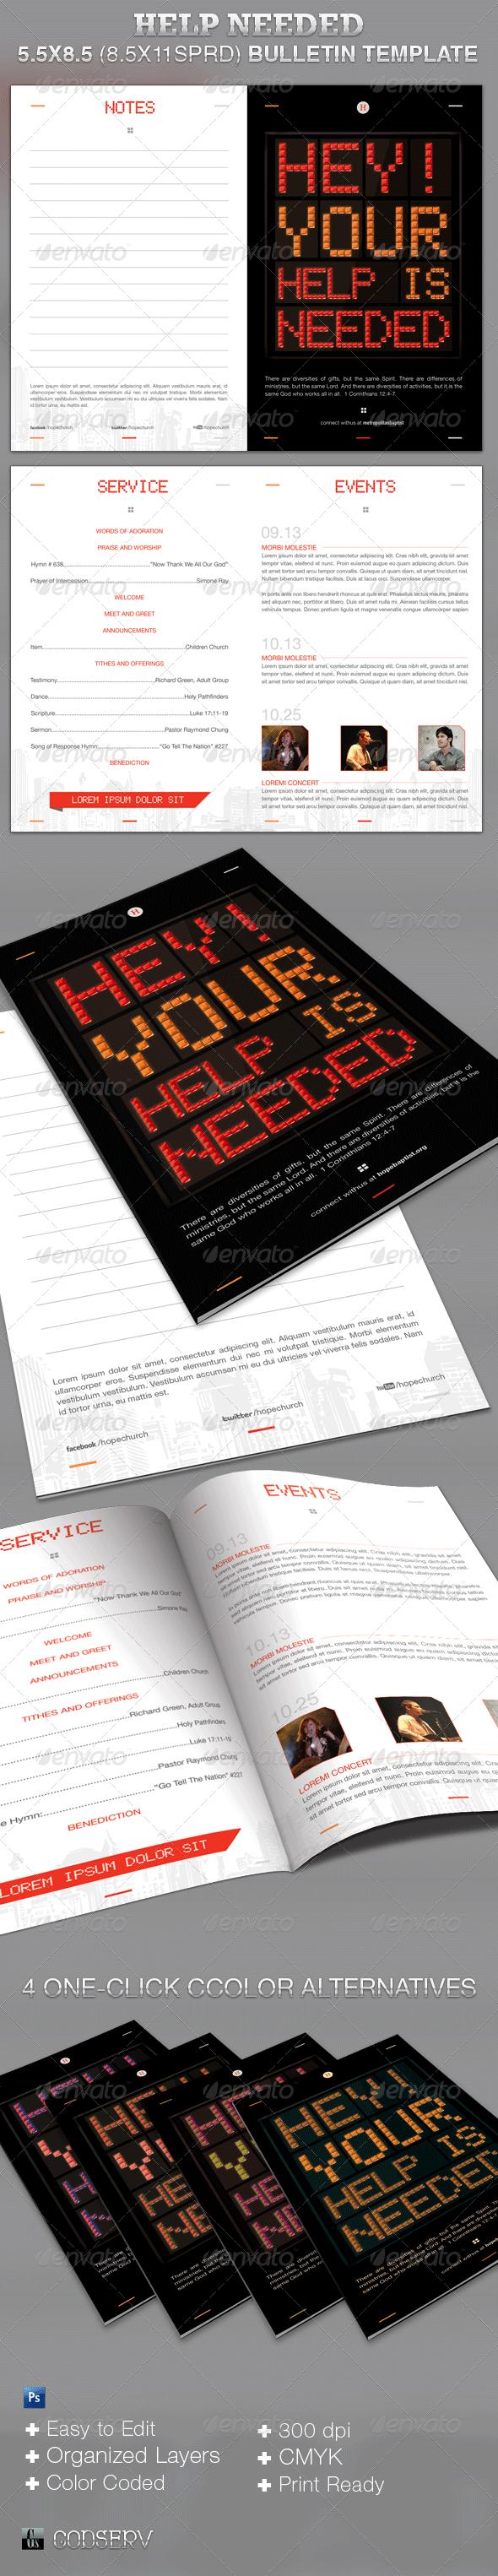 Help Needed Church Bulletin Template - Informational Brochures